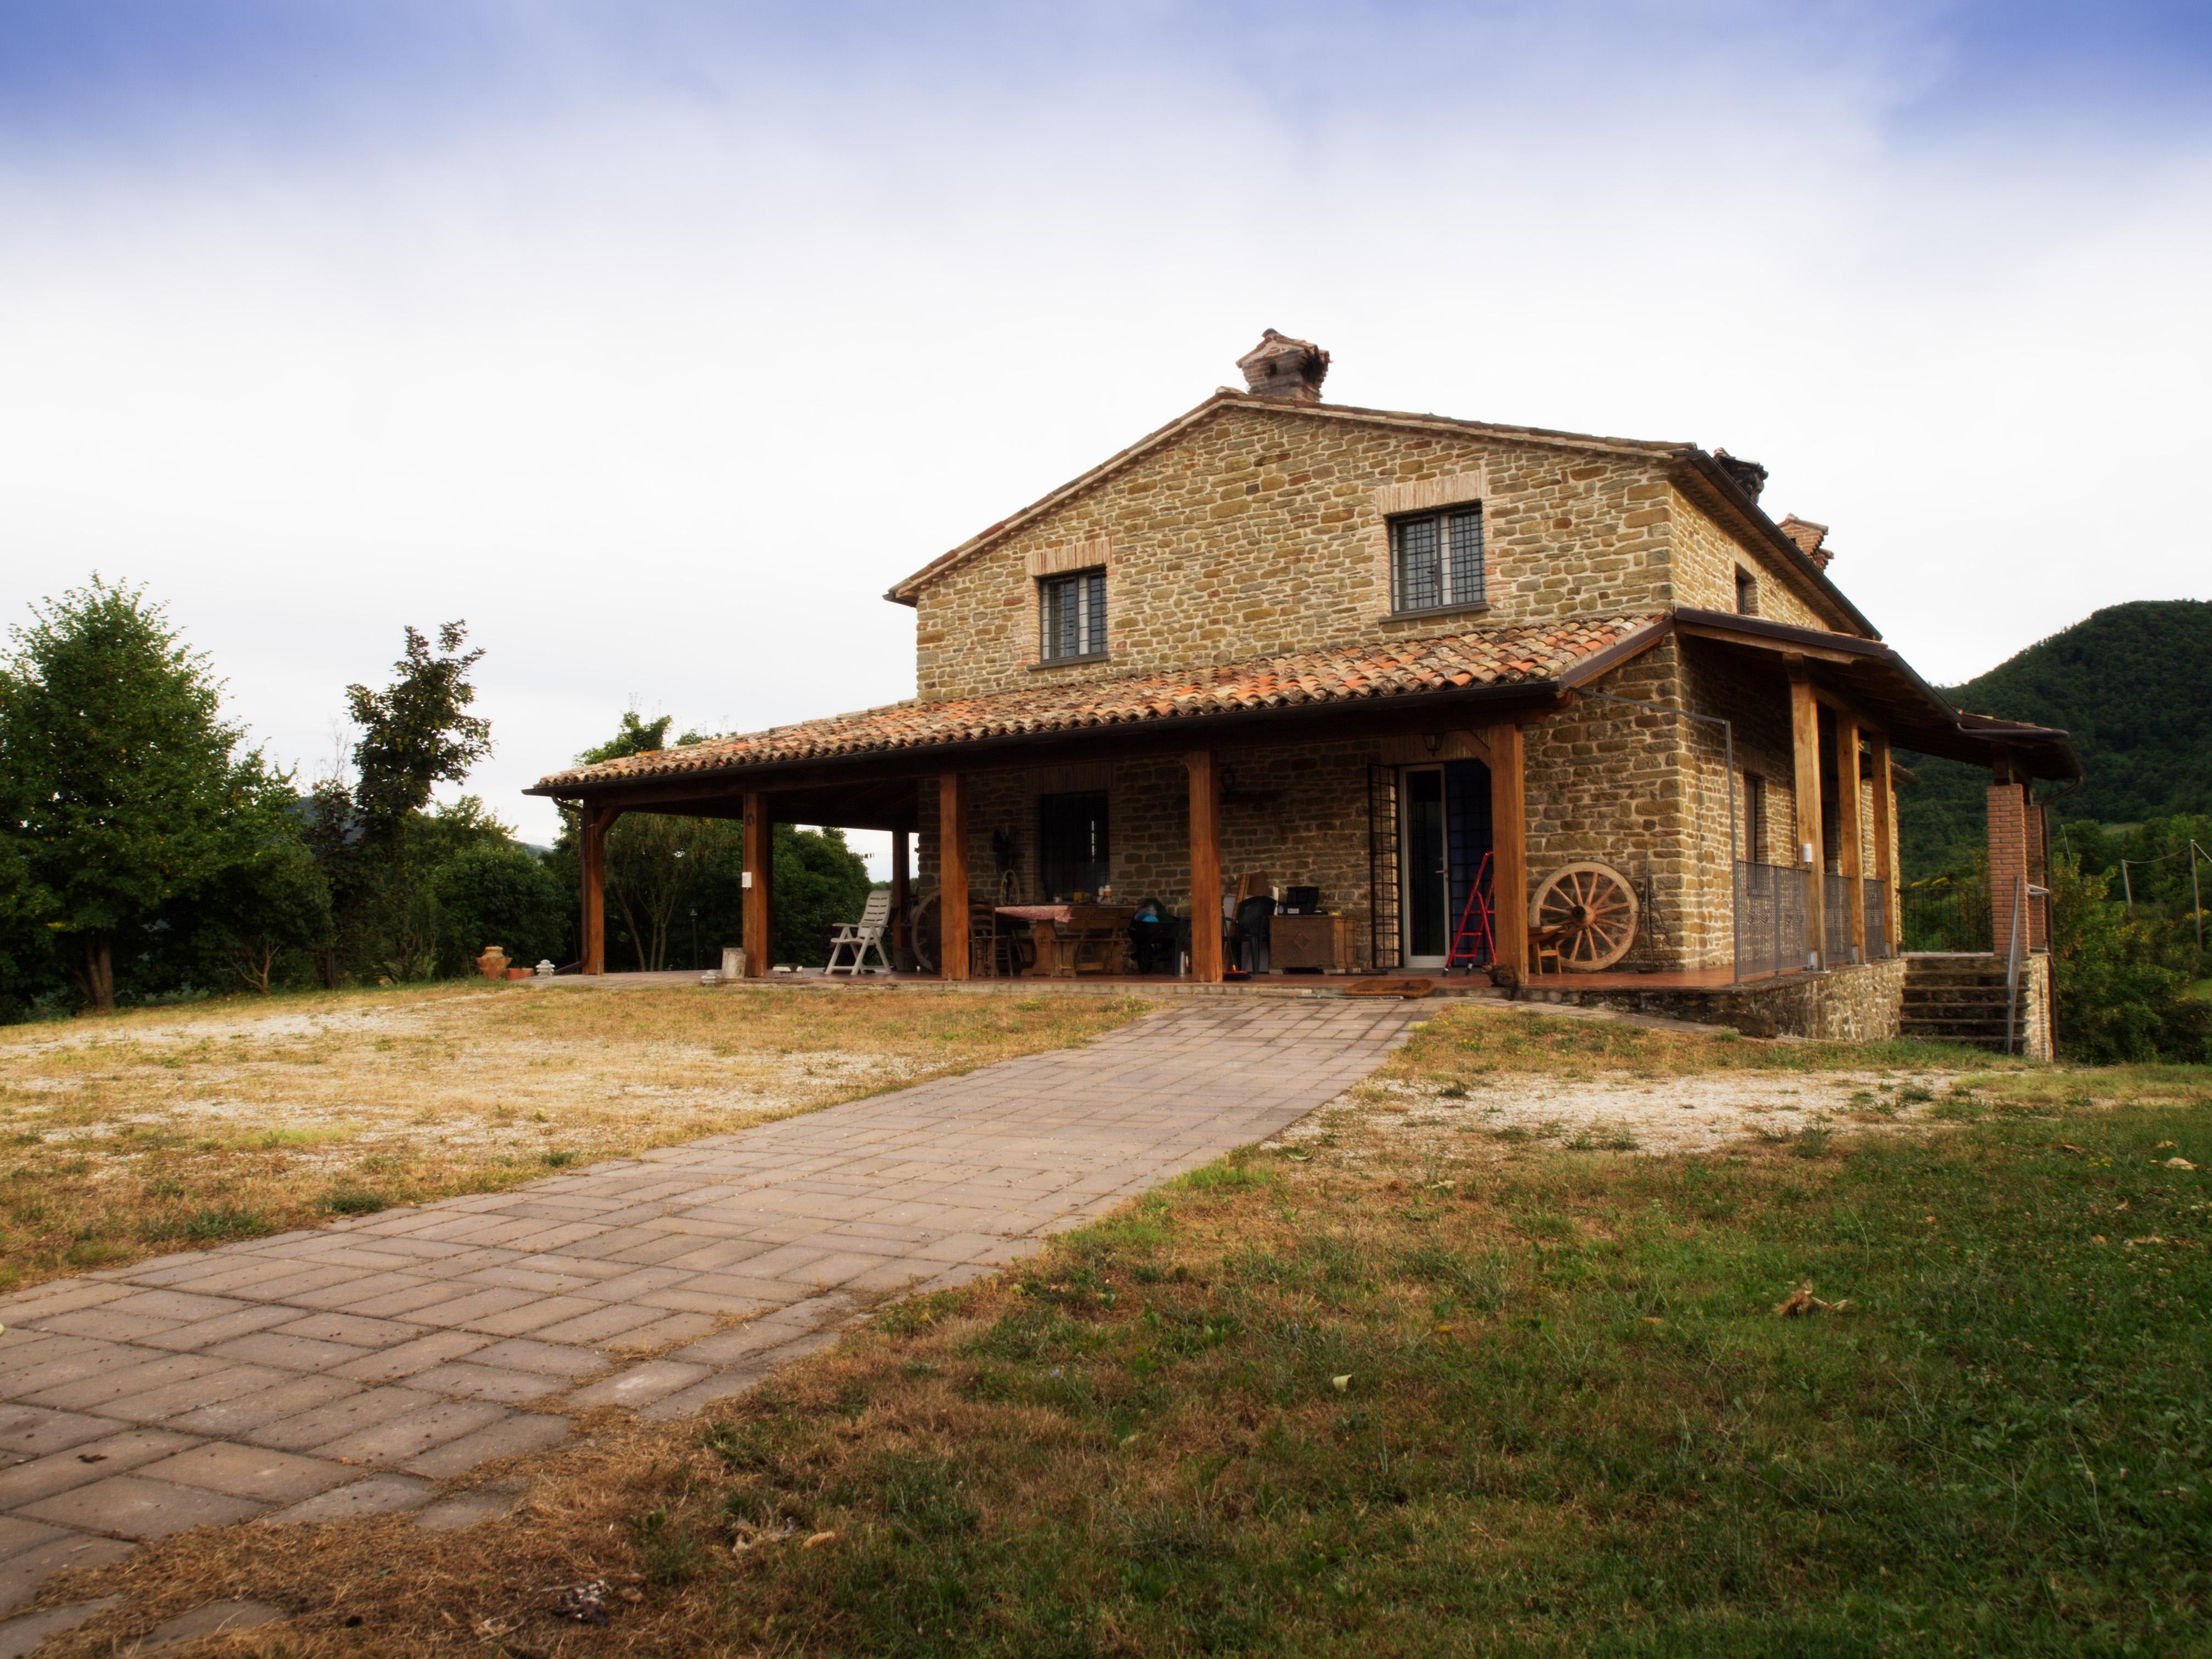 Sant'apollinare – Country Home